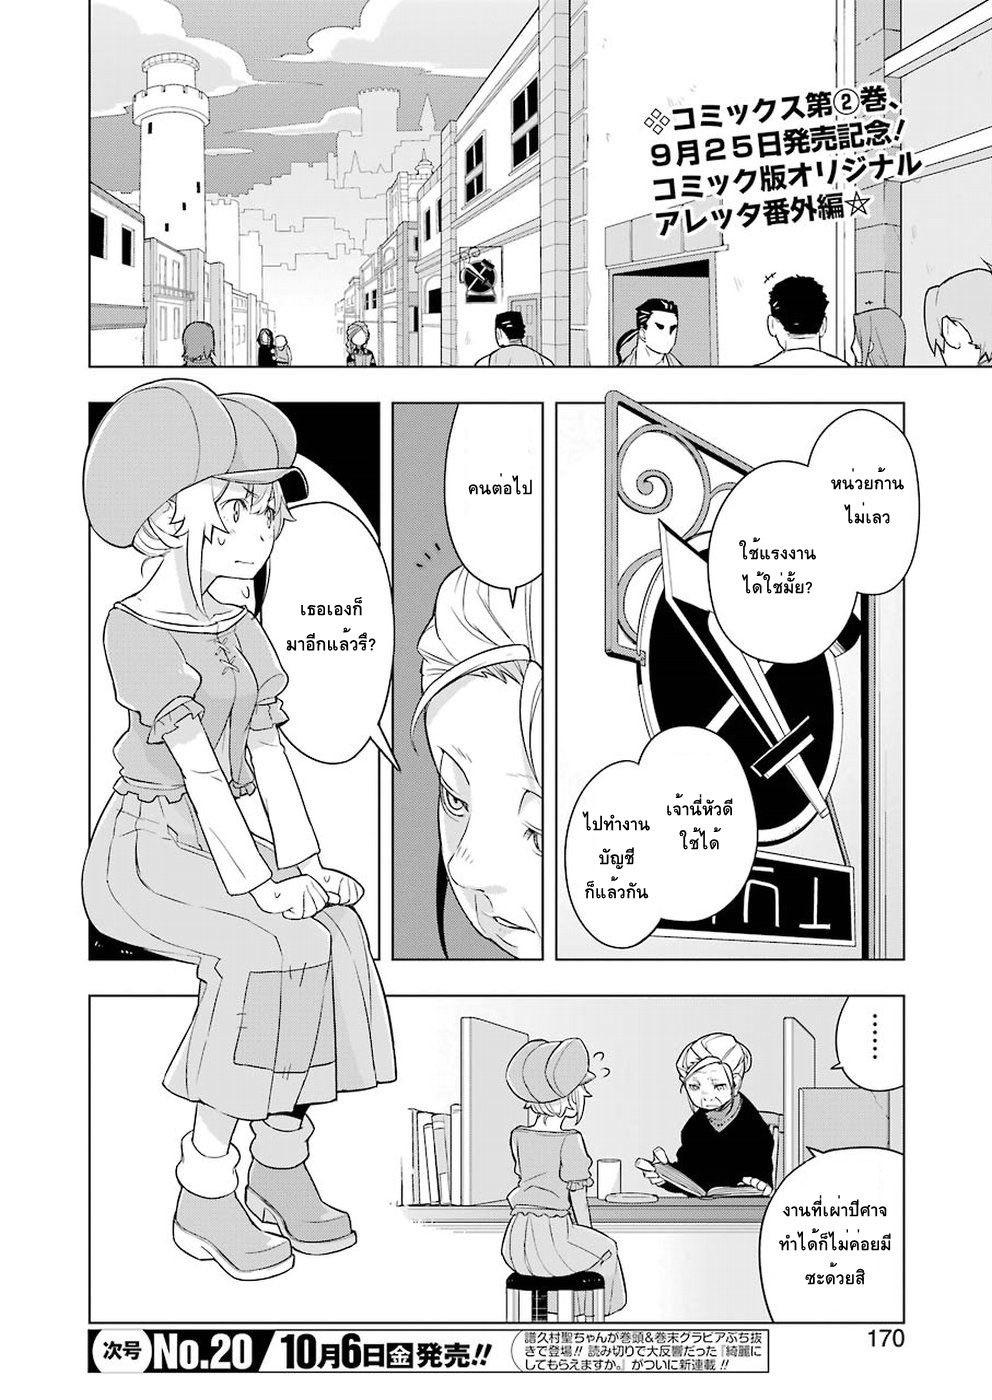 Isekai Shokudou ตอนที่ 13 TH แปลไทย